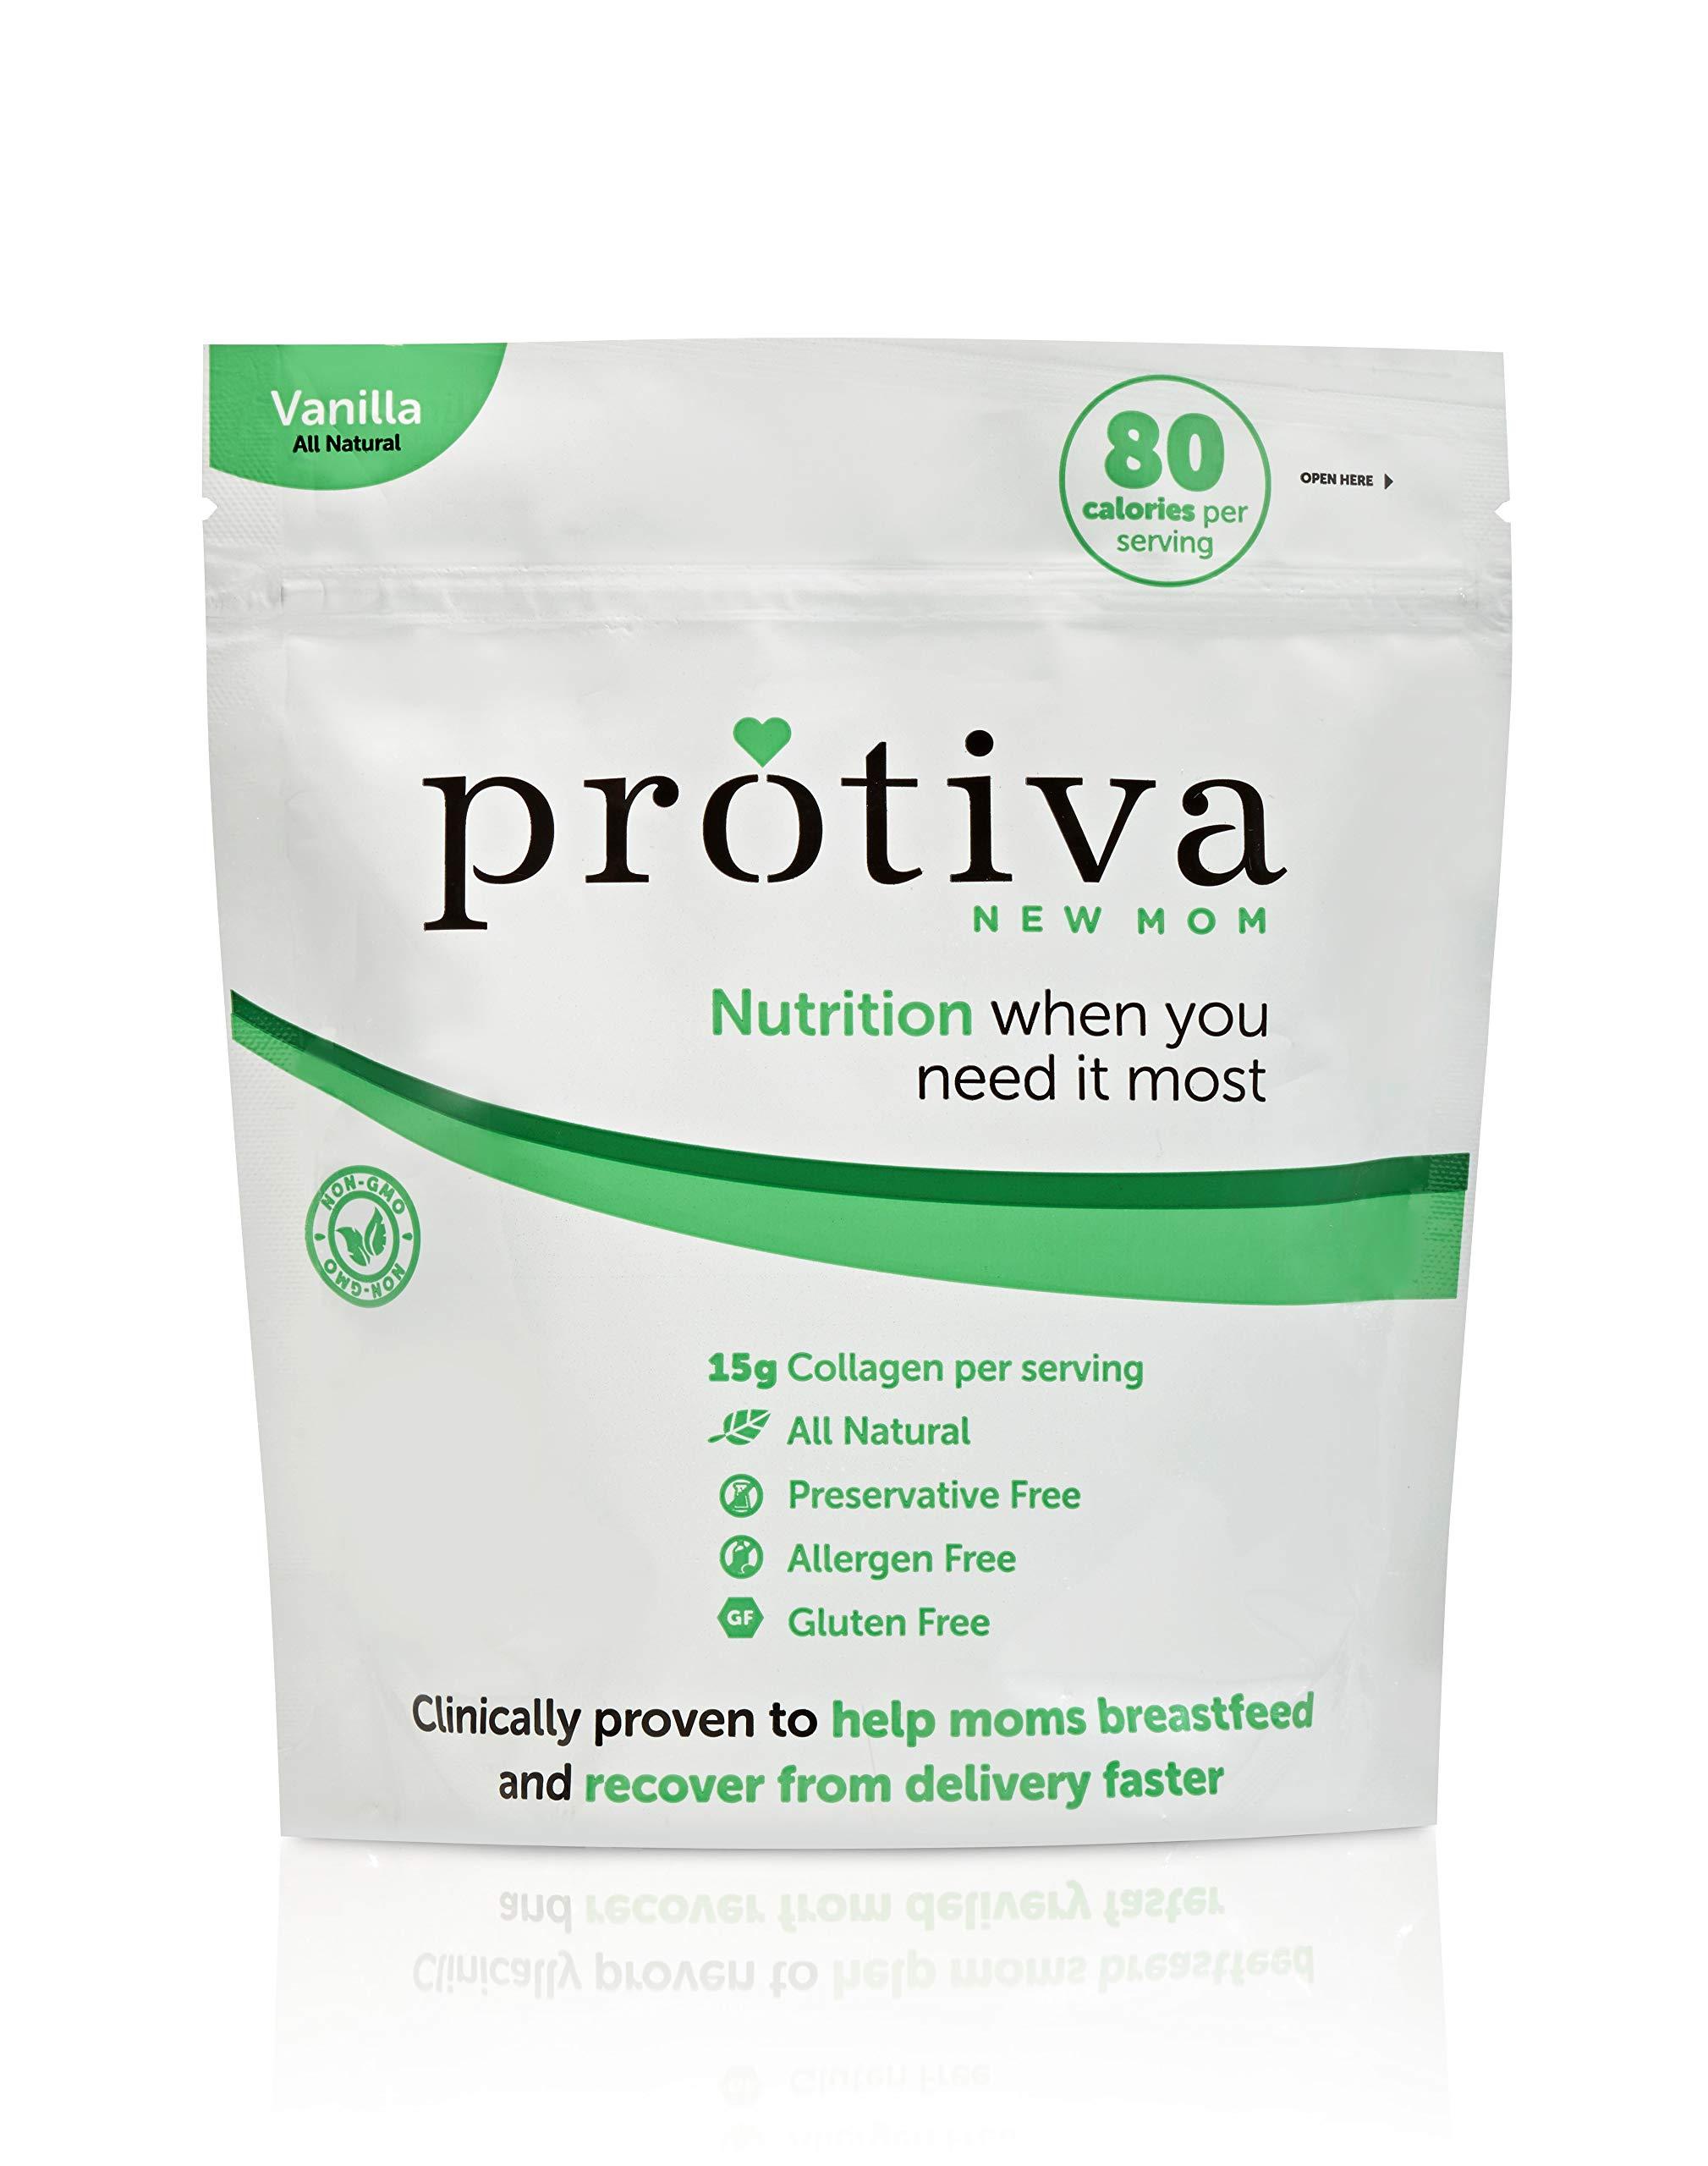 Protiva New Mom Postpartum and Breastfeeding Protein, 1lb Collagen Protein Powder, 2g Sugar, Lactose Free, Gluten Free, Allergen Free, All Natural, Non-GMO